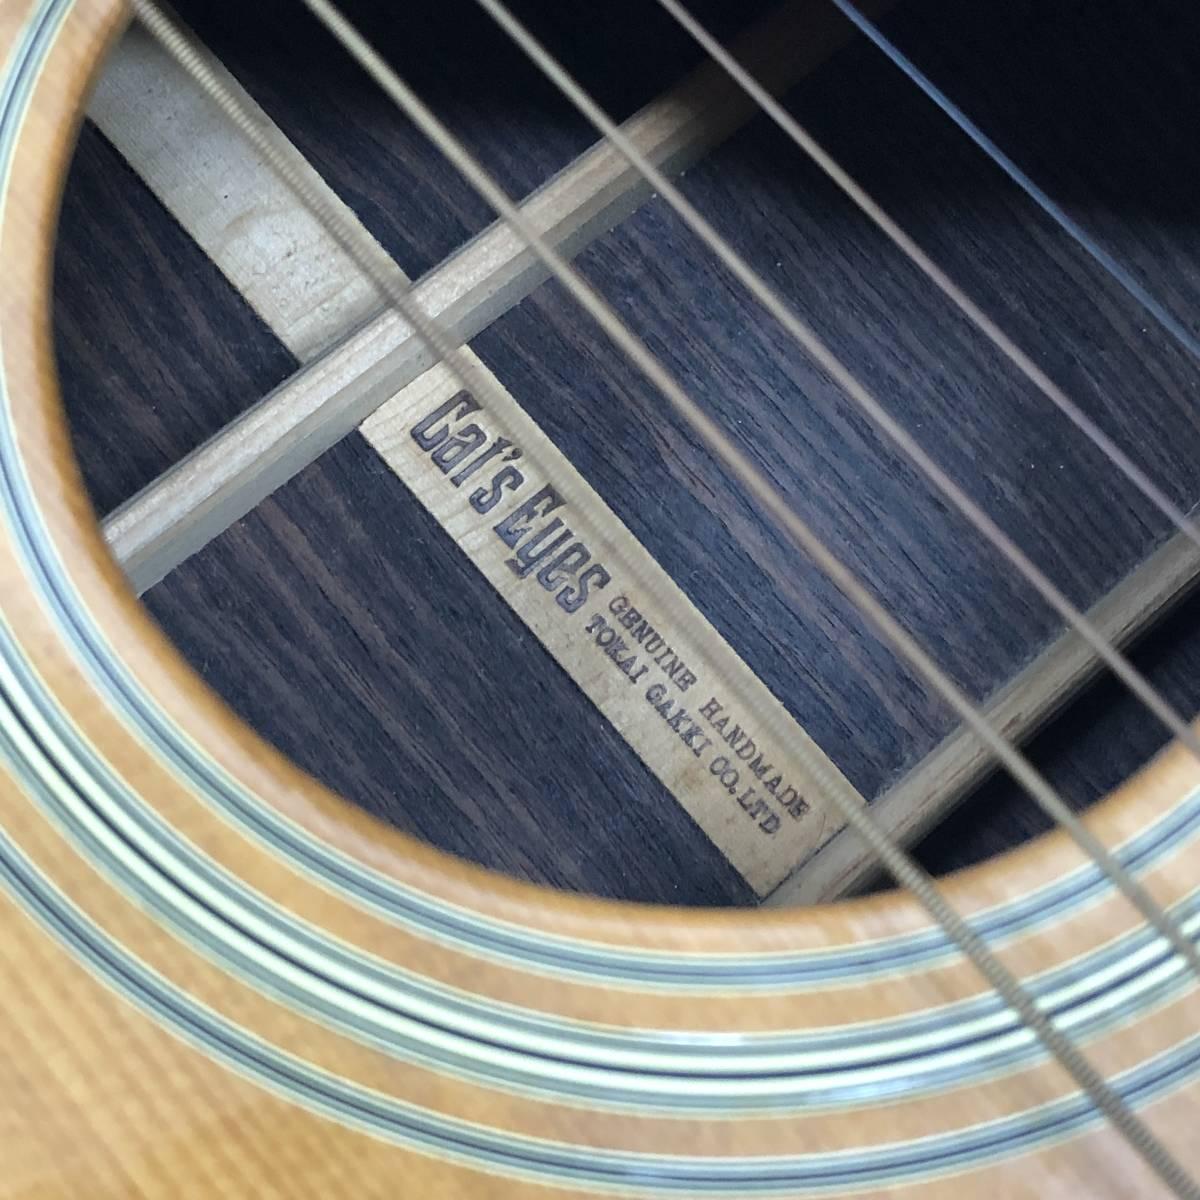 【SS】TOKAI トーカイ 東海楽器 Cat's Eyes MODEL CE500CF キャッツアイ ギターケース ハードケース 動作未確認 中古 レトロ ヴィンテージ_画像7